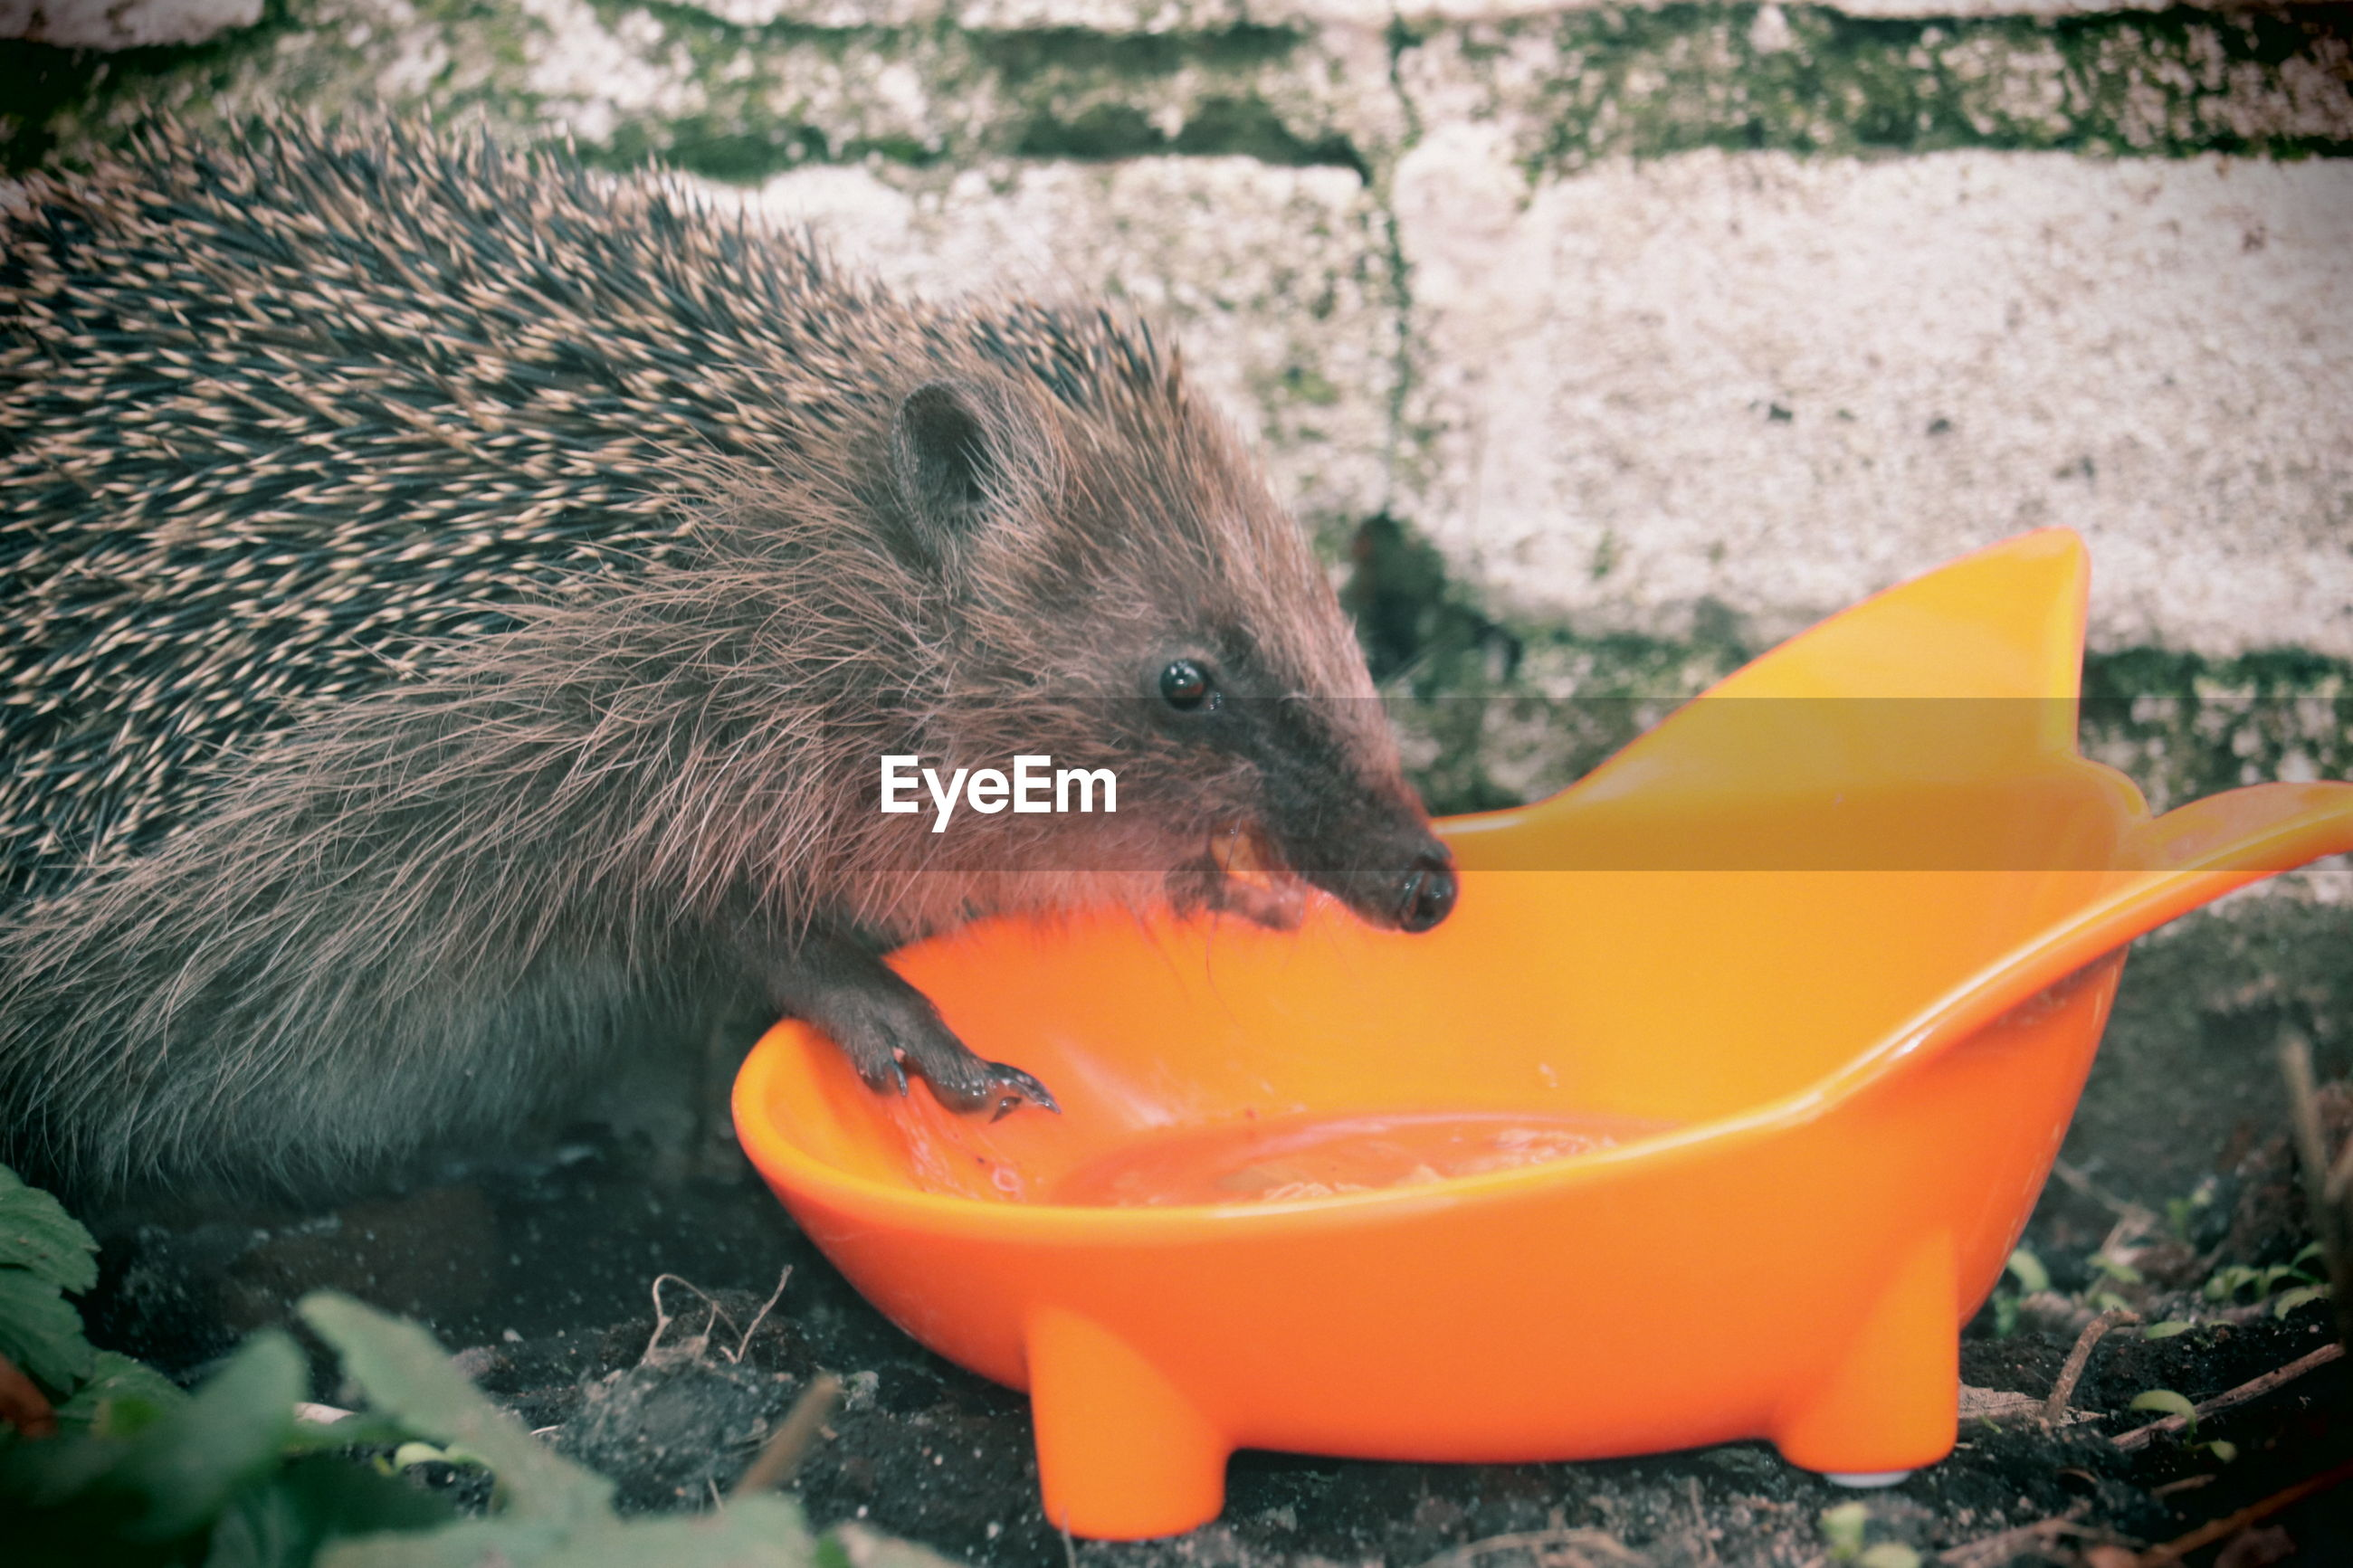 Close-up of  hedgehog  eating food